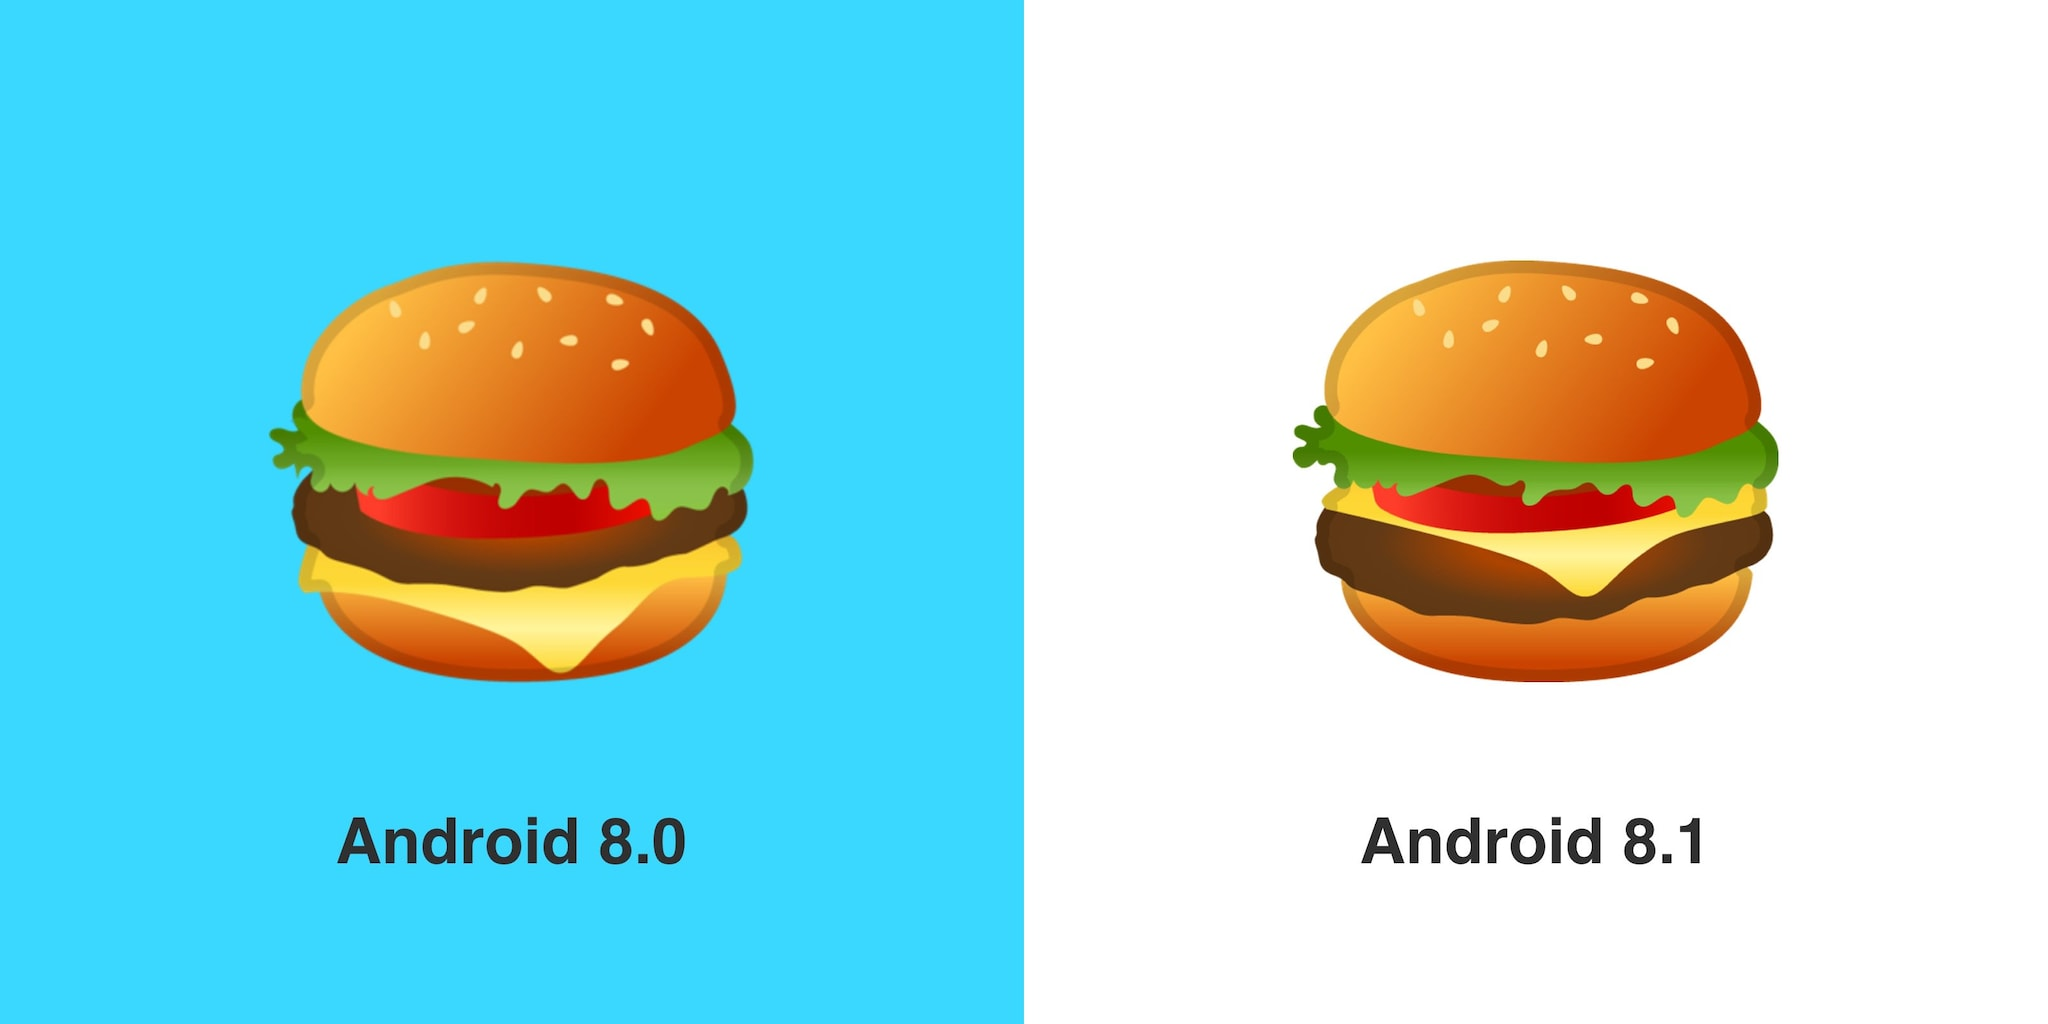 burger emoji android